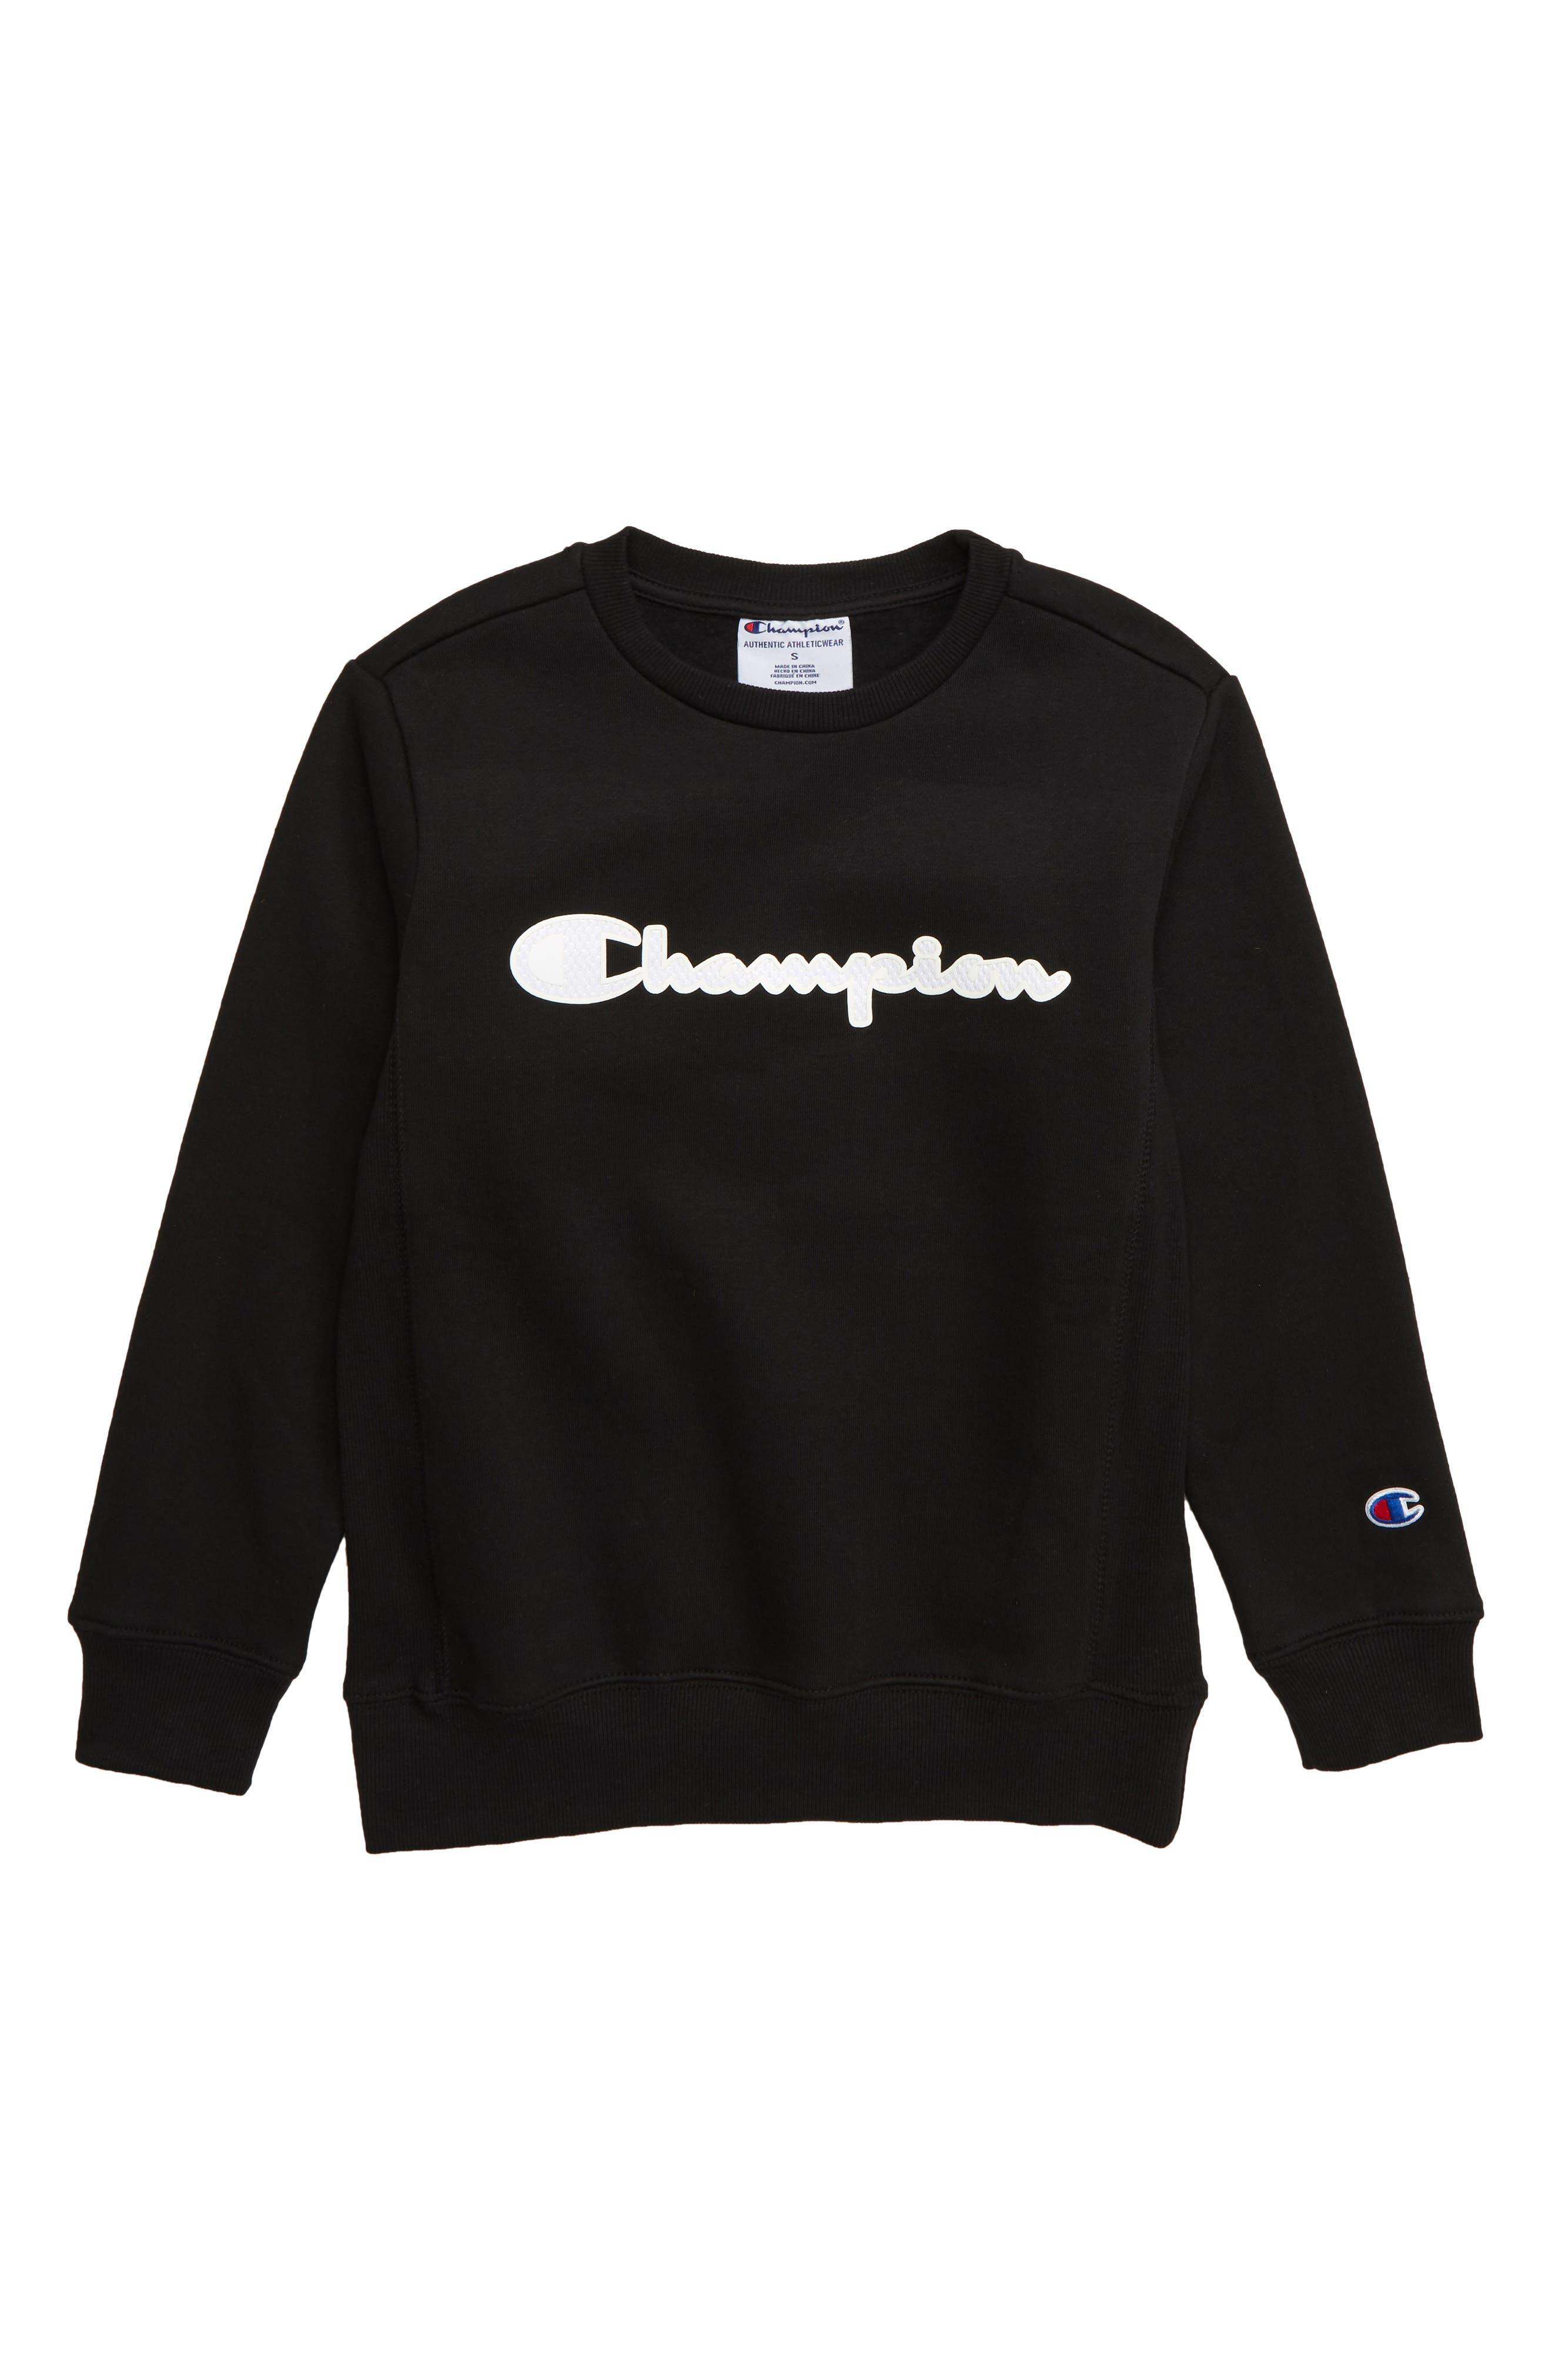 CHAMPION Premium Fleece Crewneck Sweatshirt, Main, color, BLACK